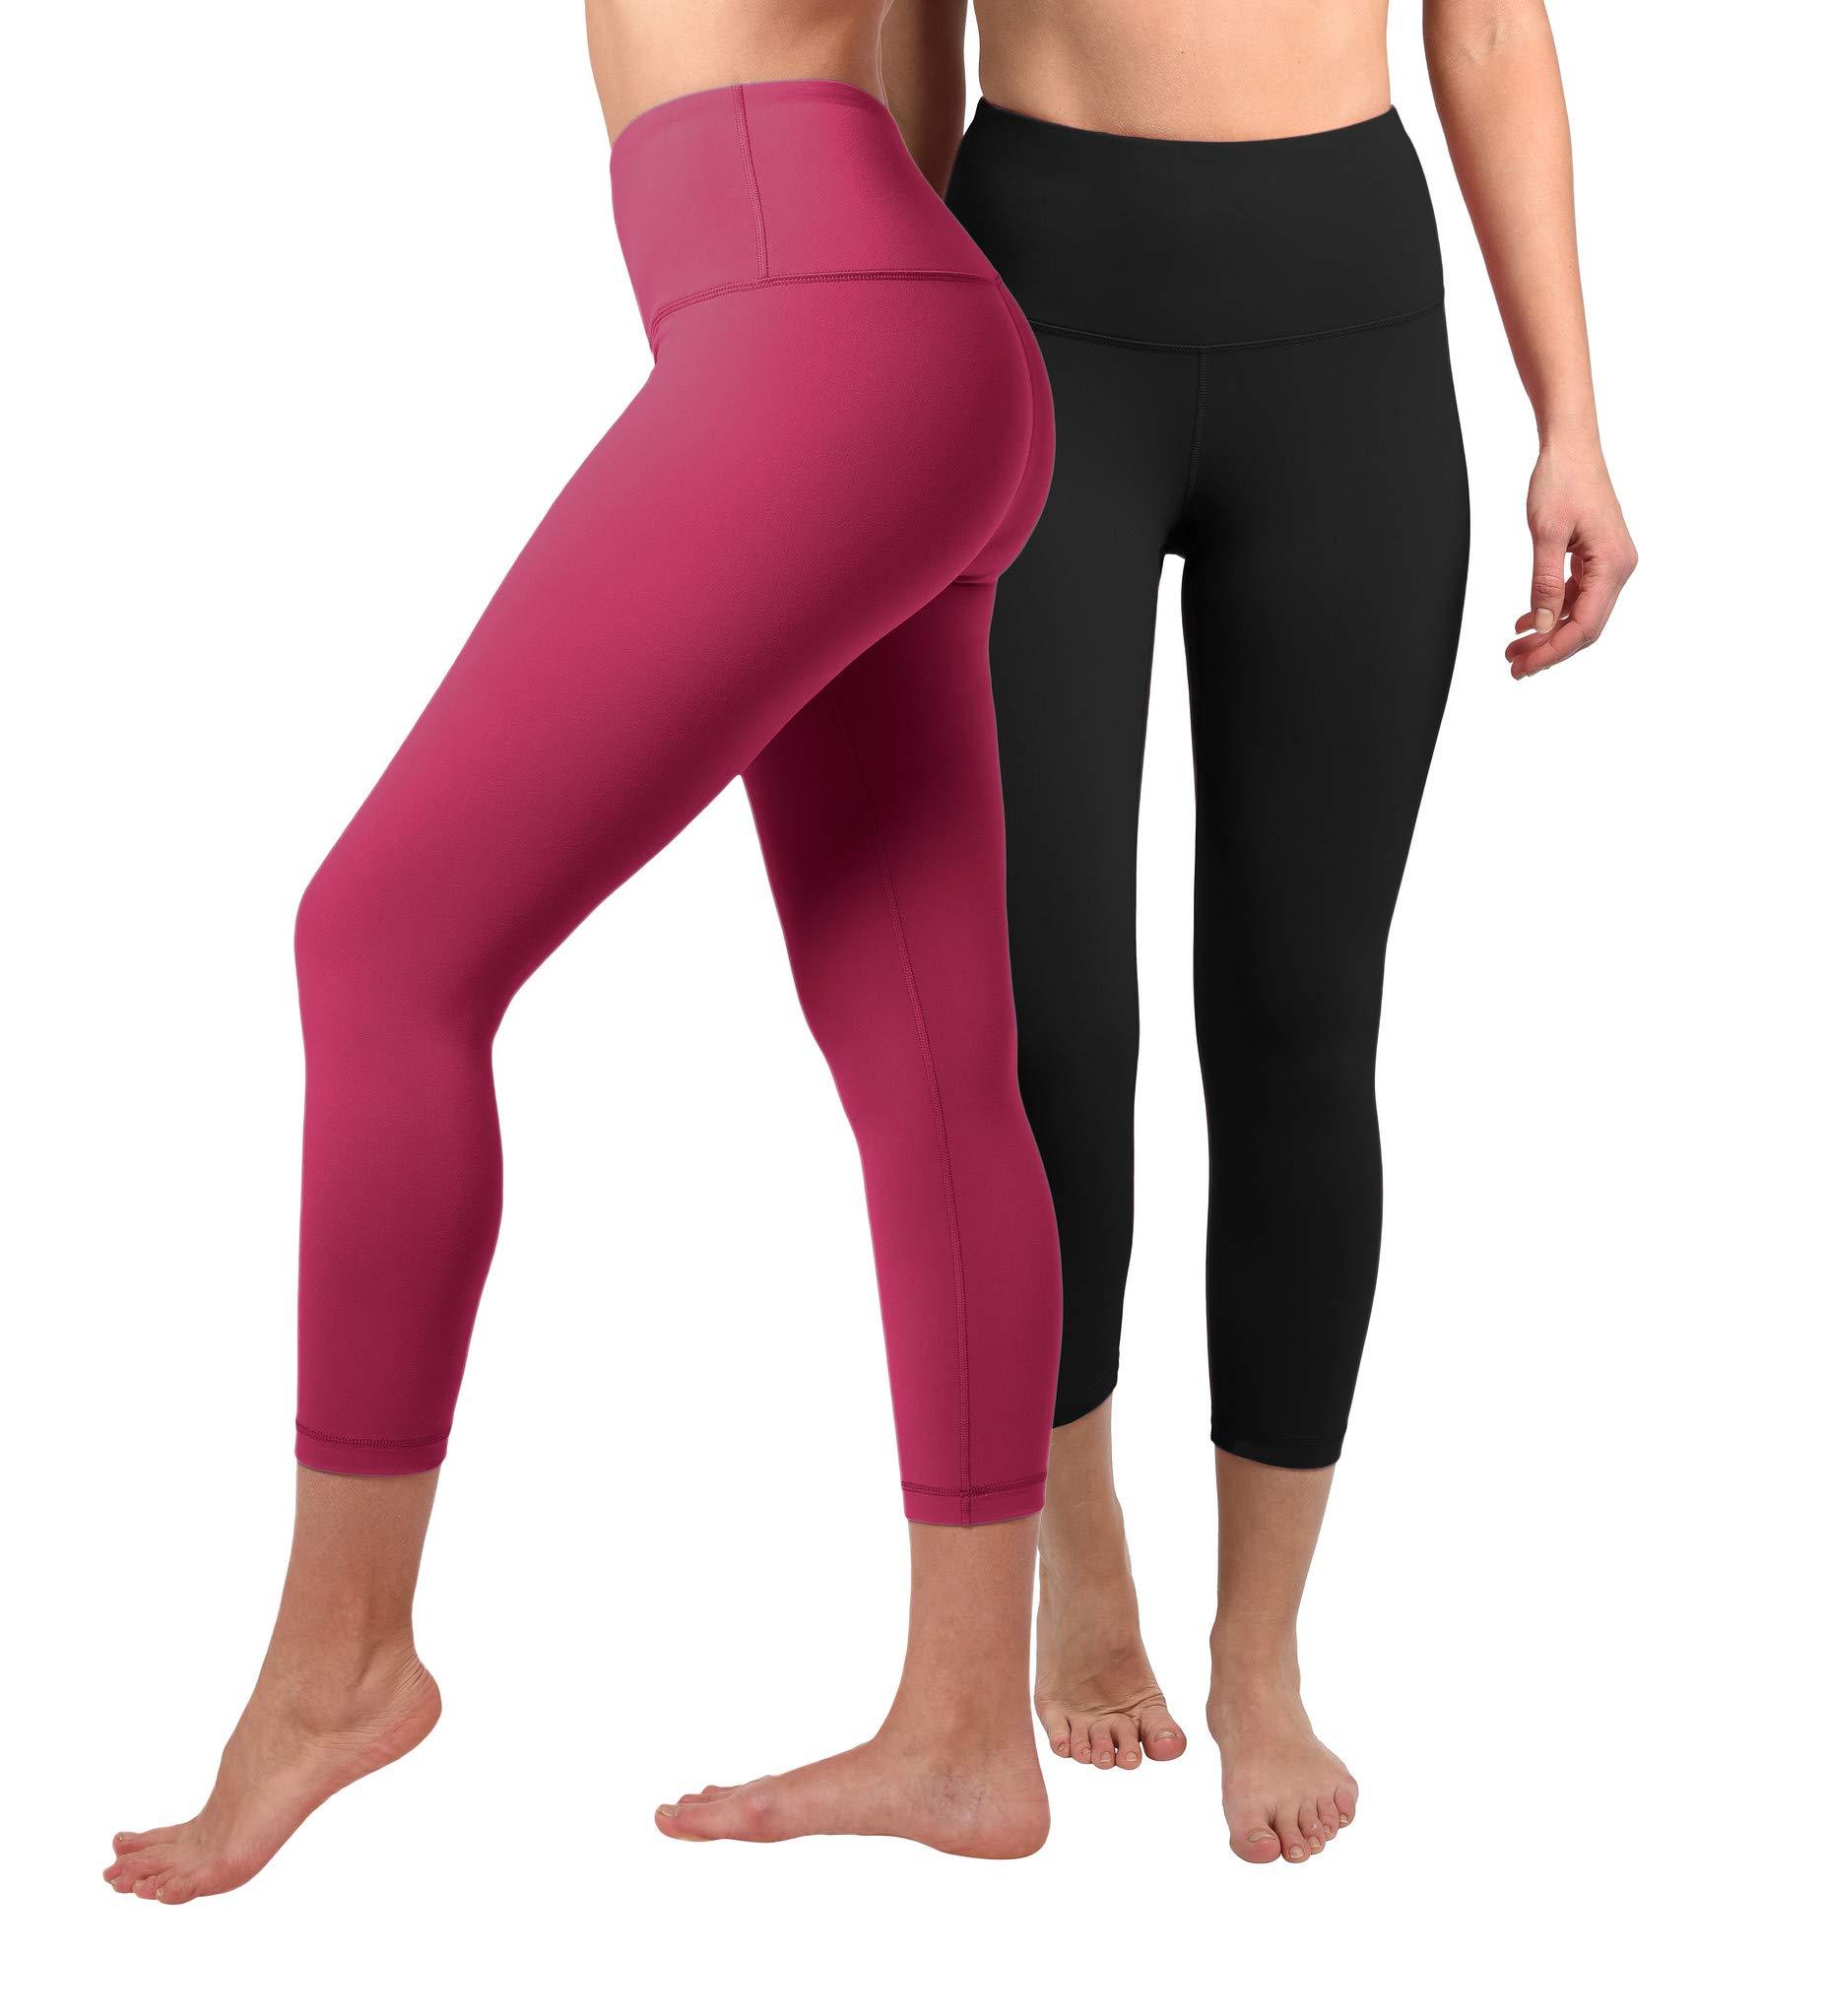 90 Degree By Reflex - High Waist Tummy Control Shapewear - Power Flex Capri - Black and Pomberry 2 Pack - XS